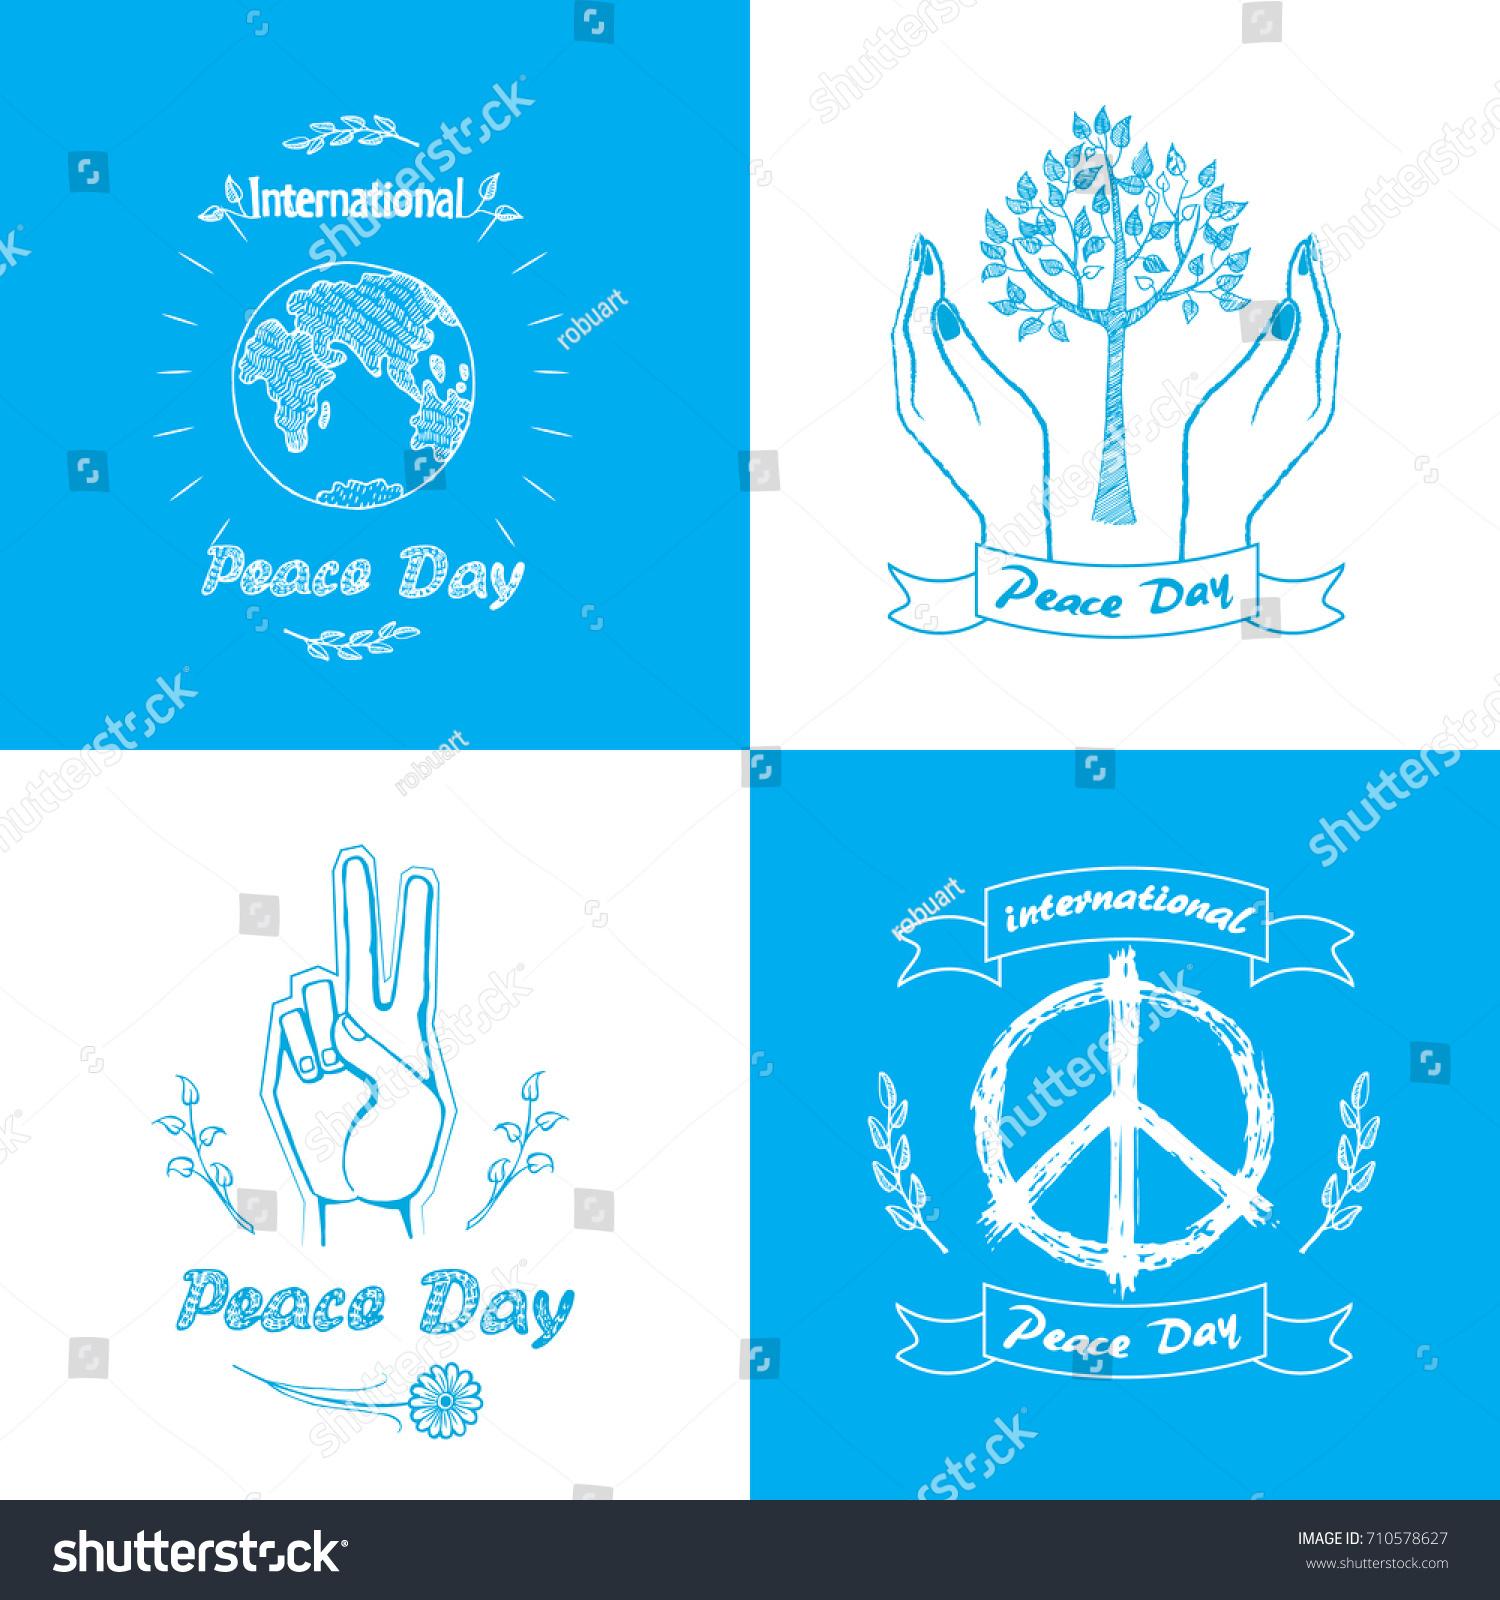 Posters international peace day vector illustration stock vector posters for international peace day vector illustration includes different love and harmony symbols as trees biocorpaavc Choice Image